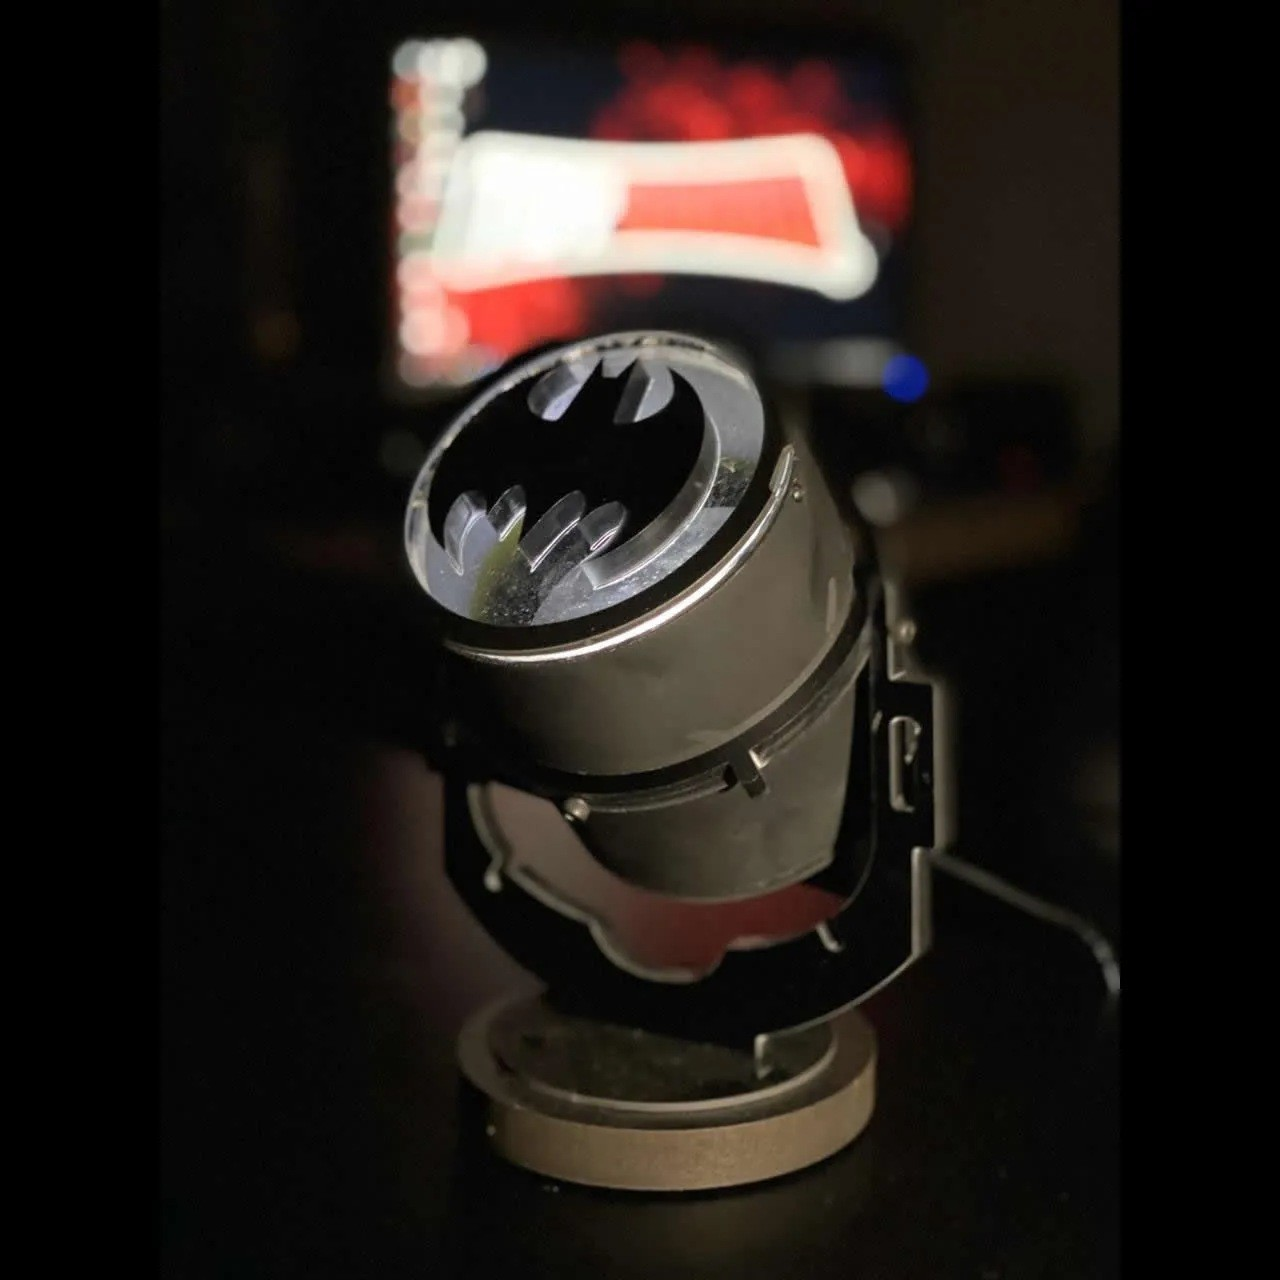 Luminária Bat Morcego - Bat Sinal - Batsinal - EV